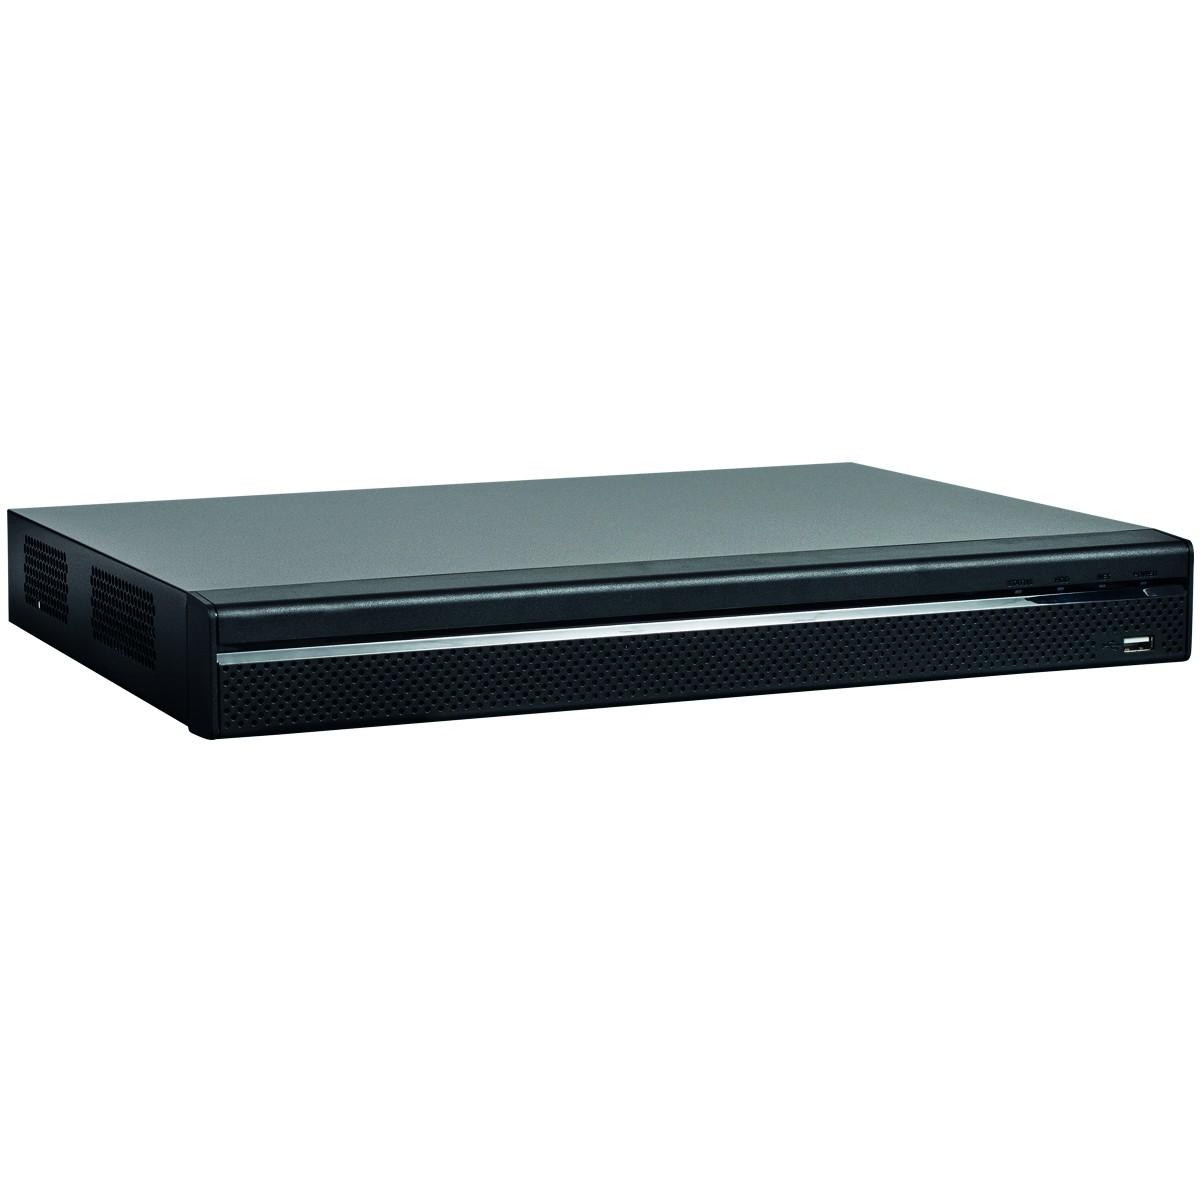 TURM Professional HDCVI / TVI / AHD / IP / XVR Rekorder 4 MP (Aufnahmen bis 2 MP), 32 Kanal